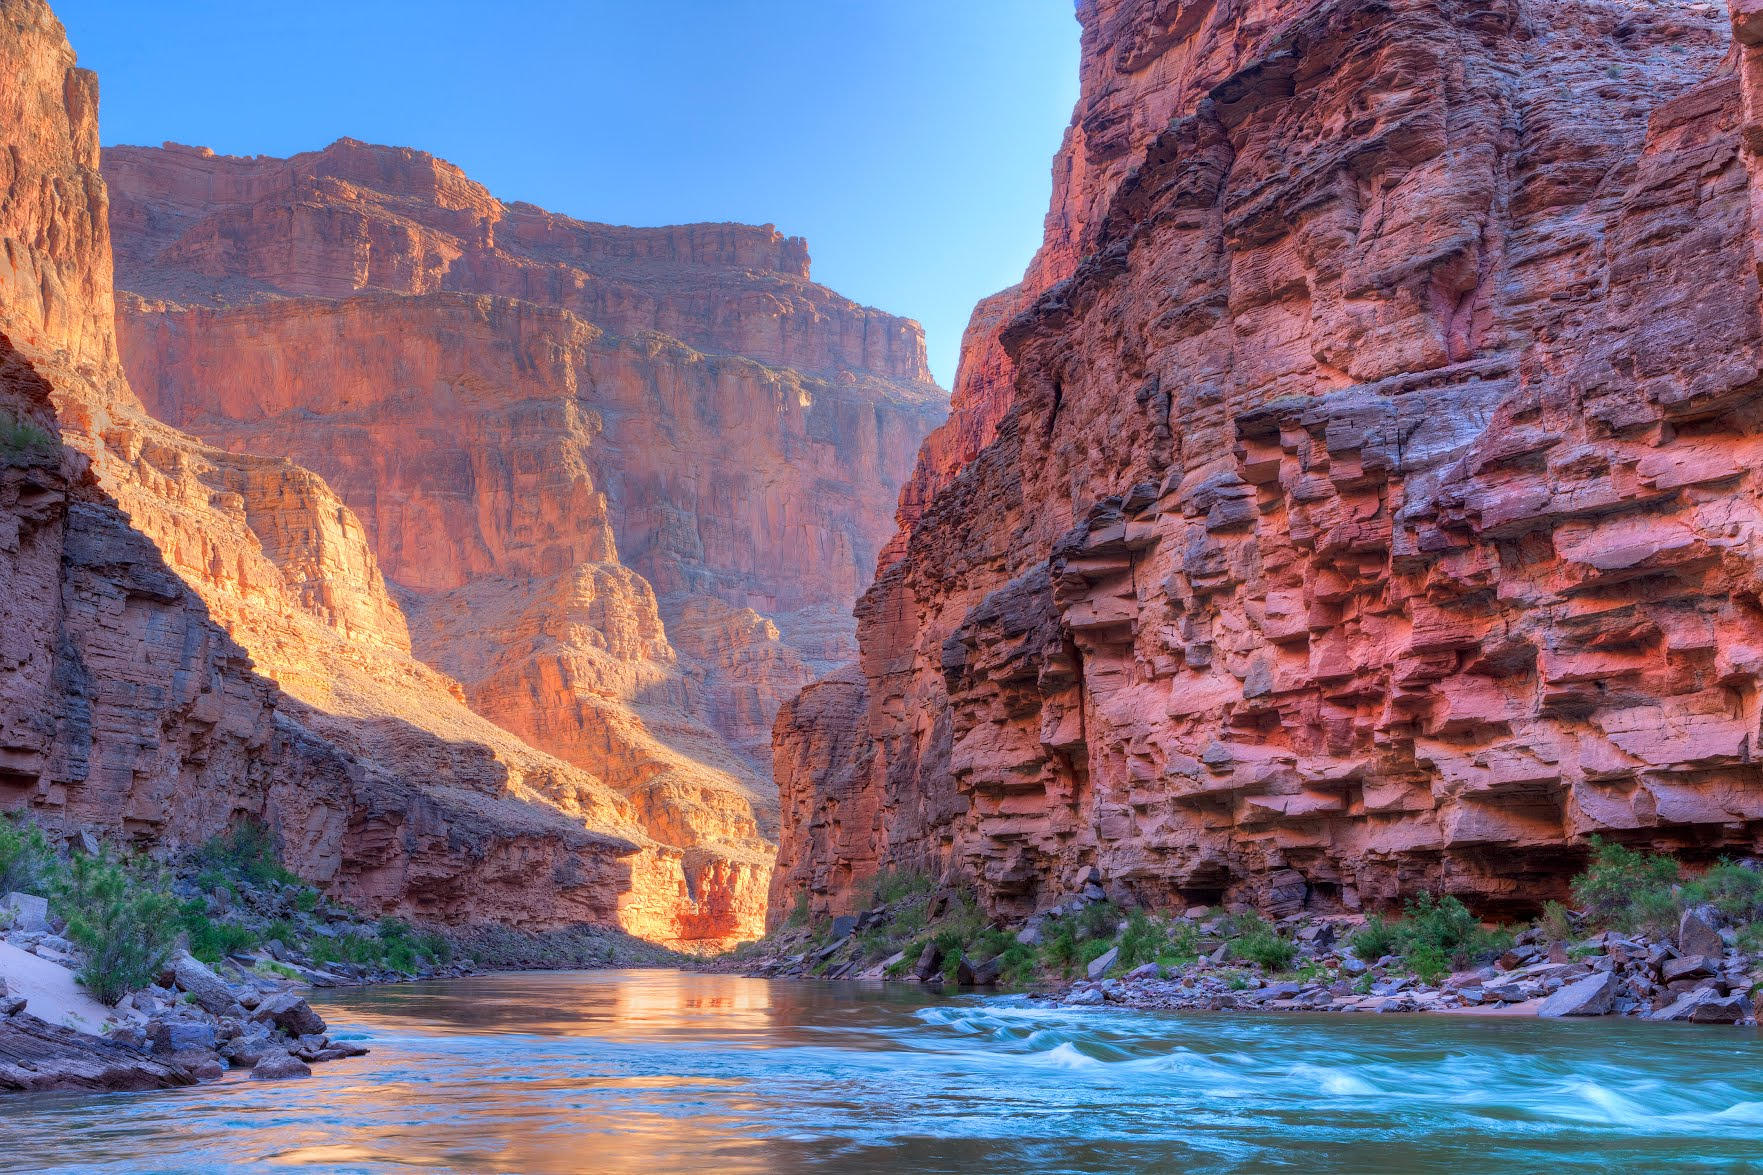 https://s1.travix.com/blog/north-america-las-vegas-grand-canyon-river.jpg